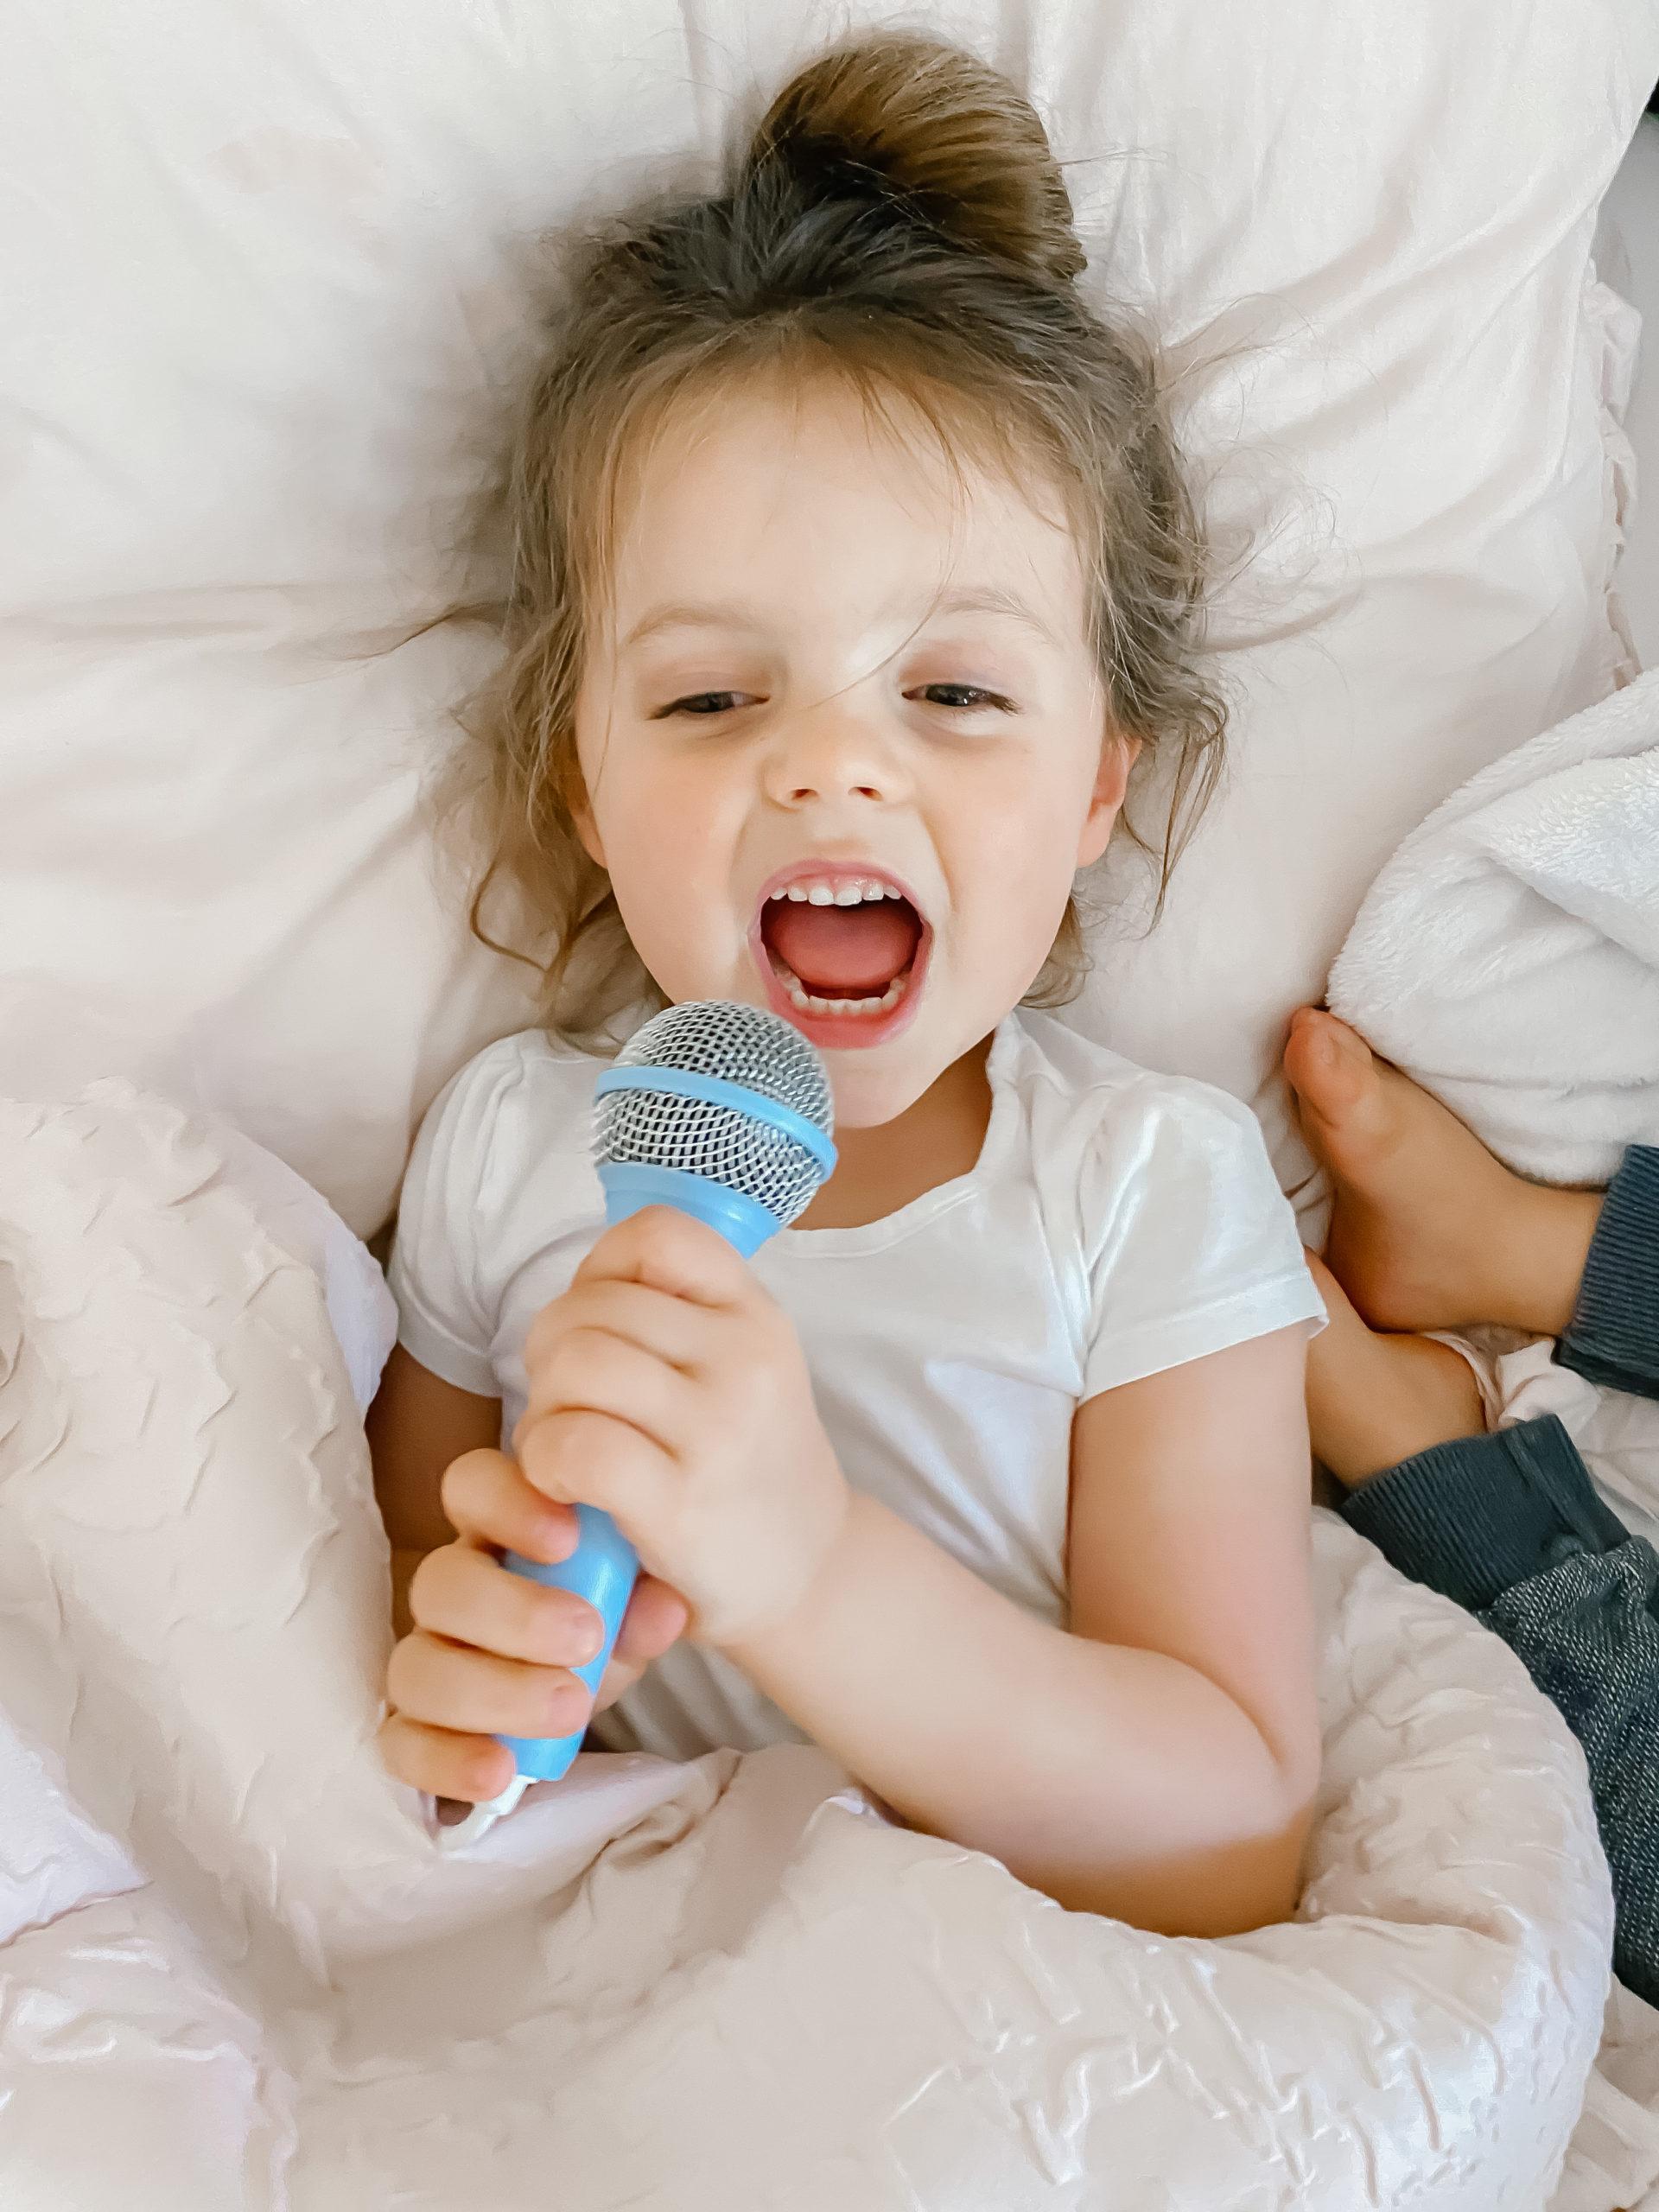 fun toys - molly karaoke microphone